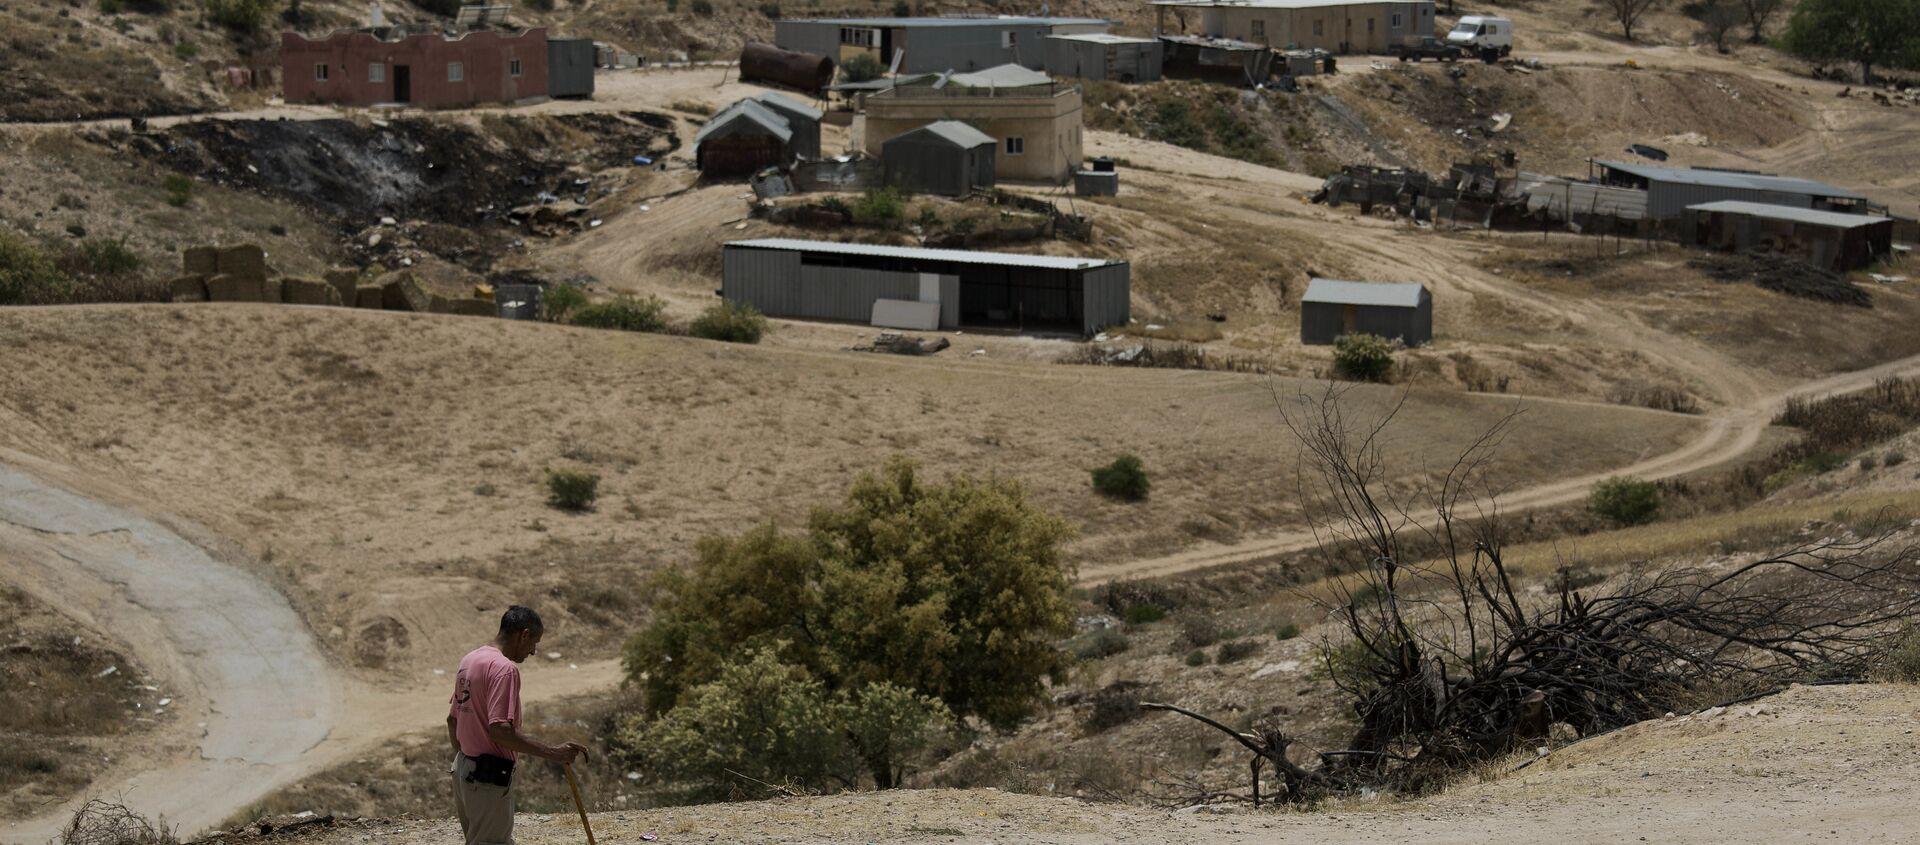 In this May 12, 2015 file photo, a Bedouin man walks through the village of Umm Al-Hiran in the Israeli Negev desert - Sputnik International, 1920, 28.06.2021